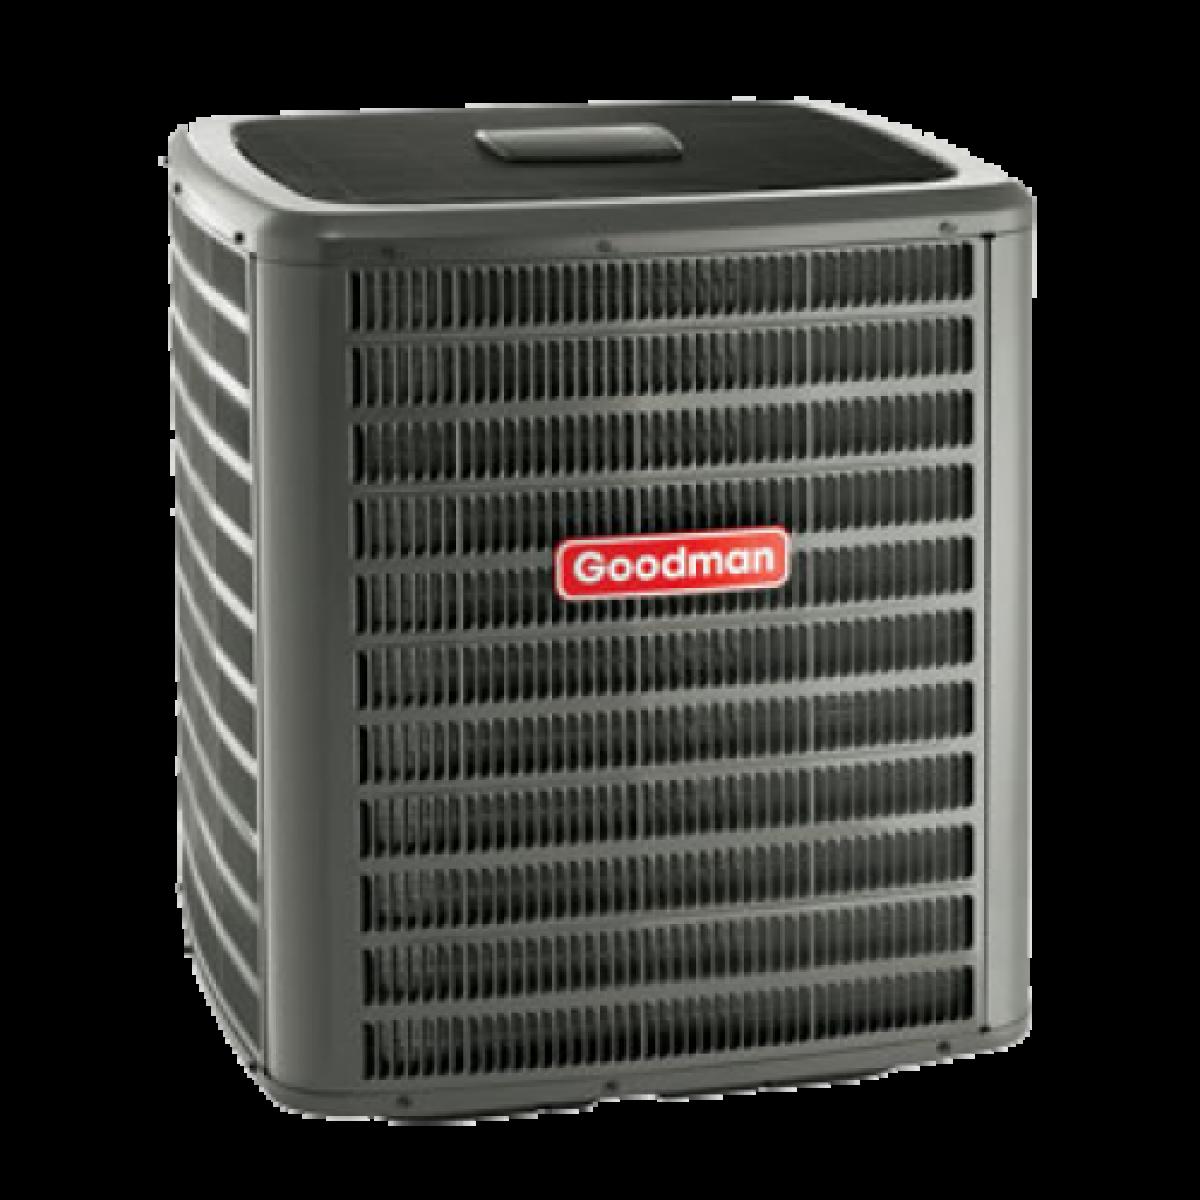 Goodman 4 0 Ton 14 5 Seer Heat Pump Split System 3 5 Ton